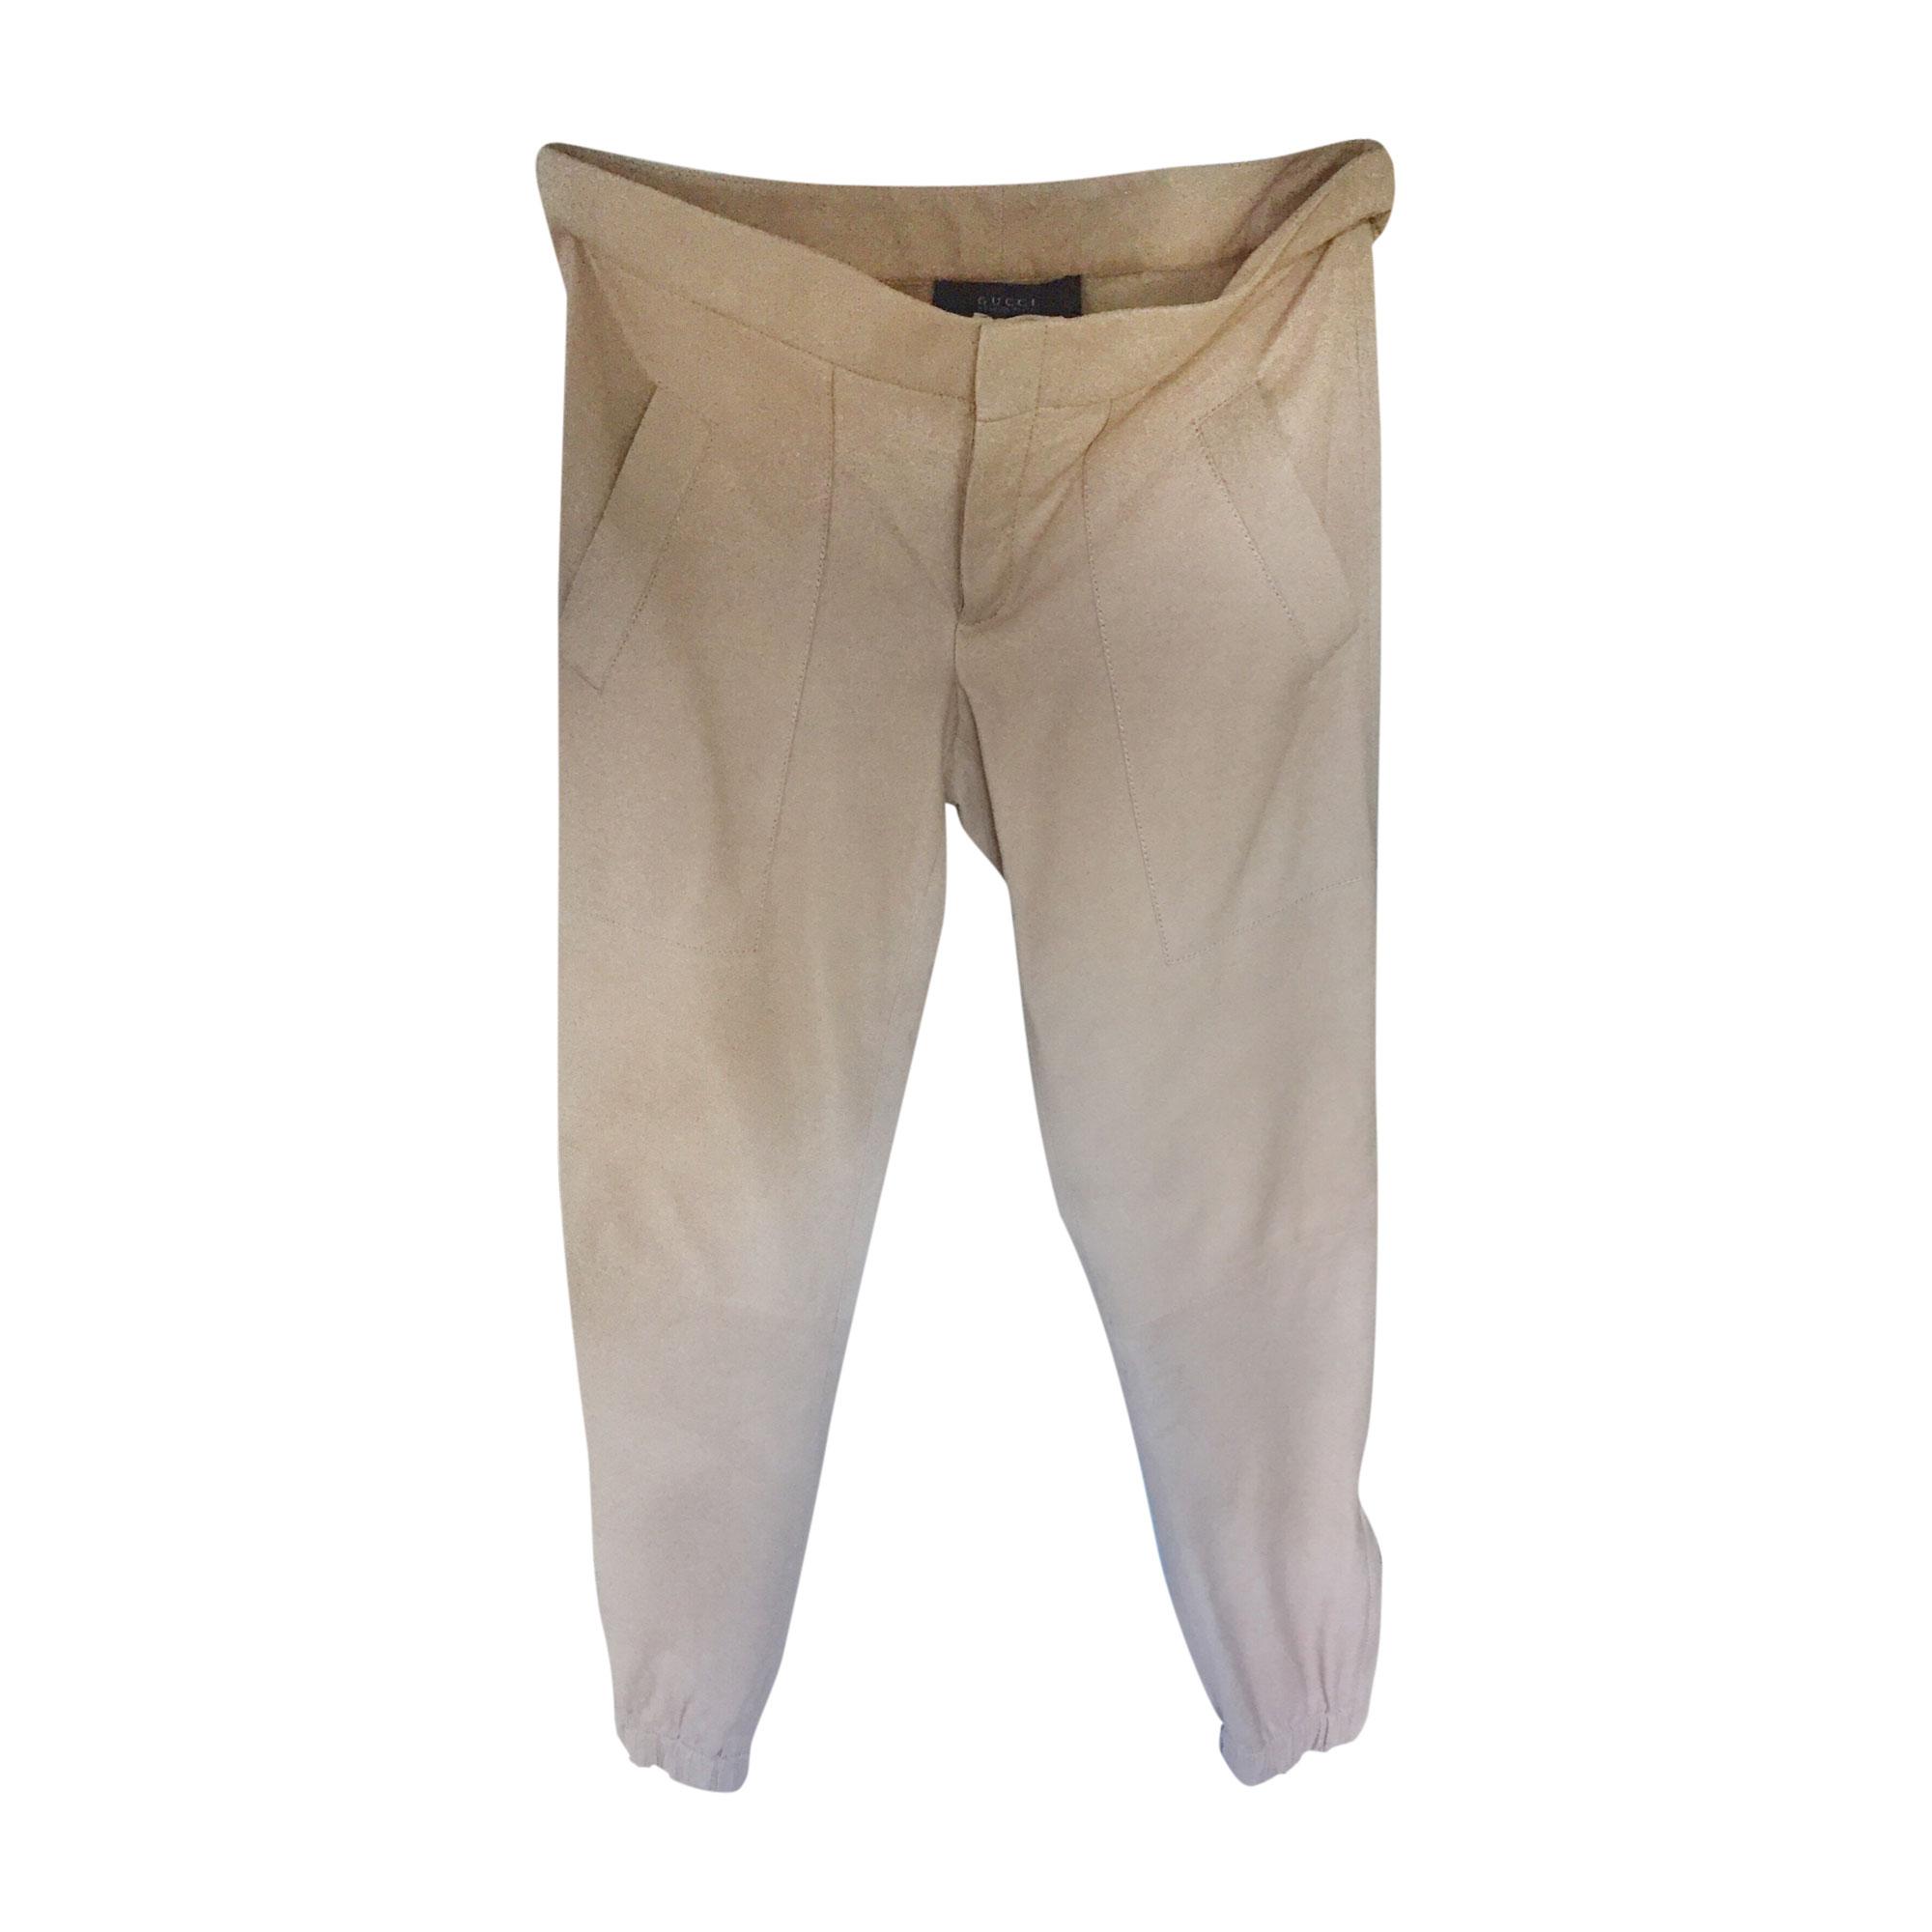 Skinny Pants, Cigarette Pants GUCCI Beige, camel